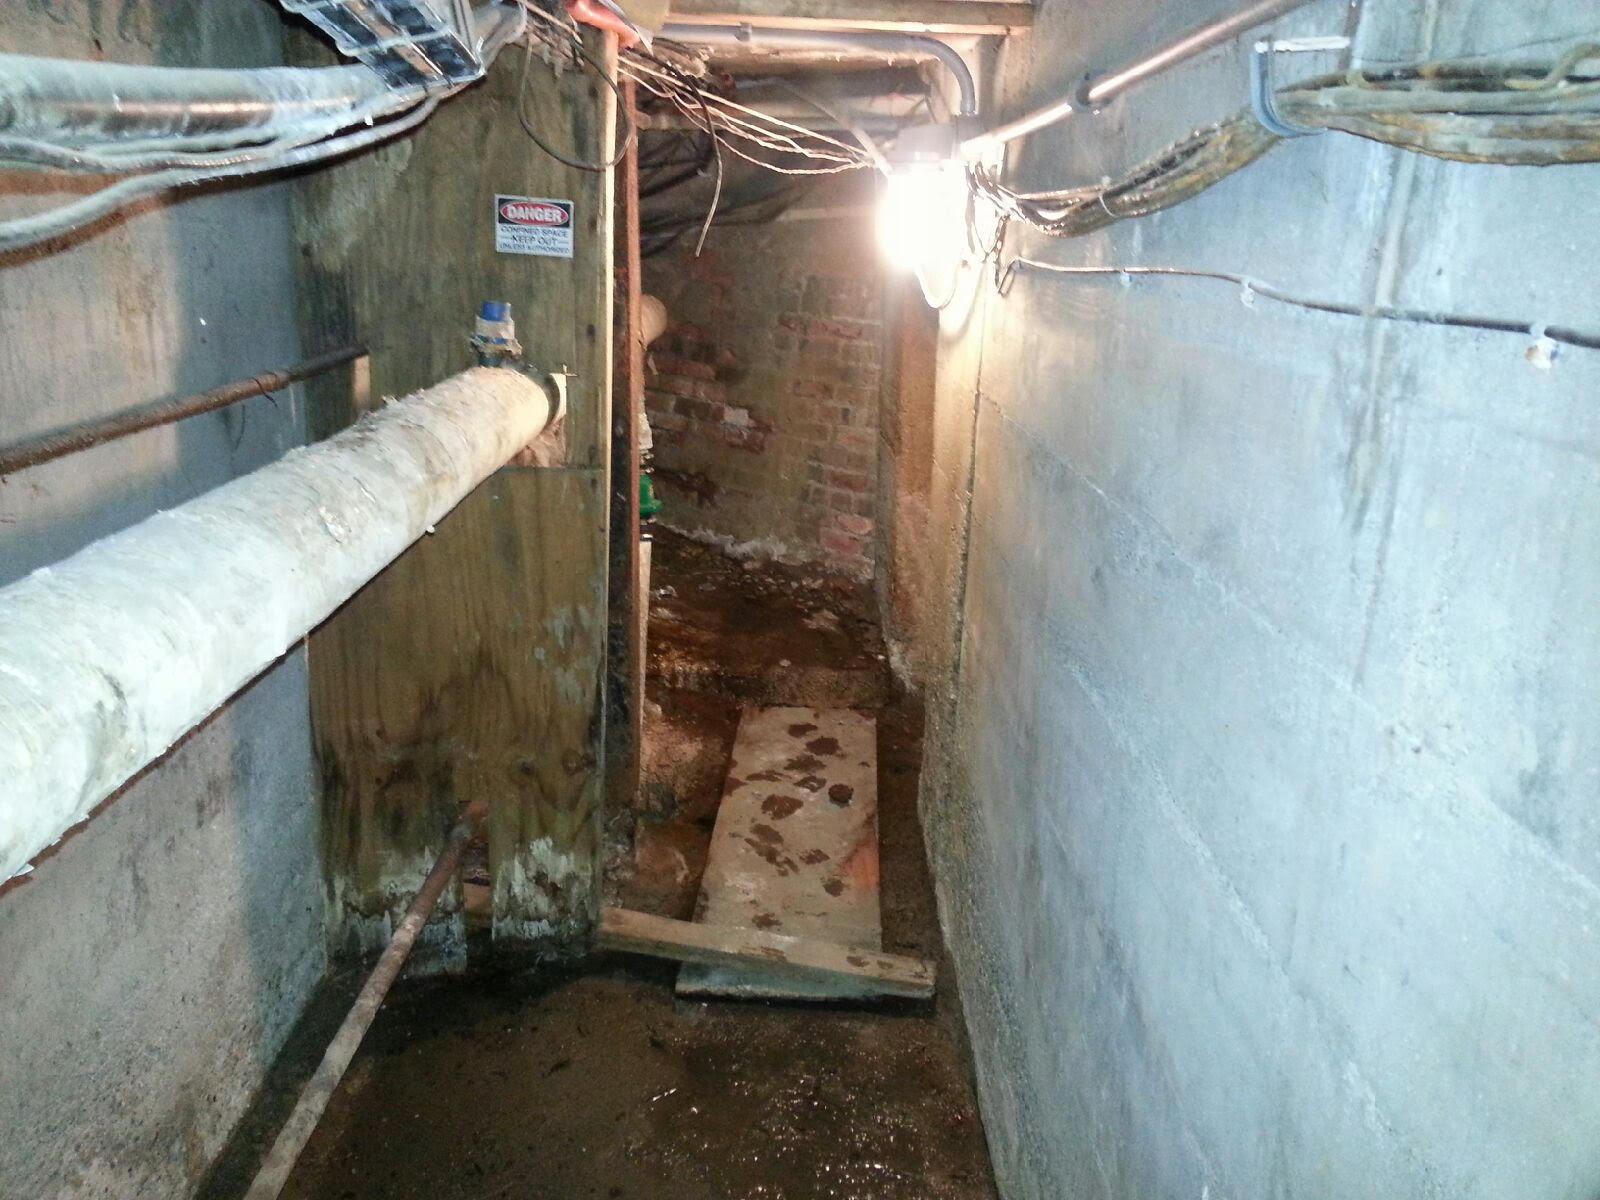 A Tour Steam Tunnels Beneath The Eastern Michigan University